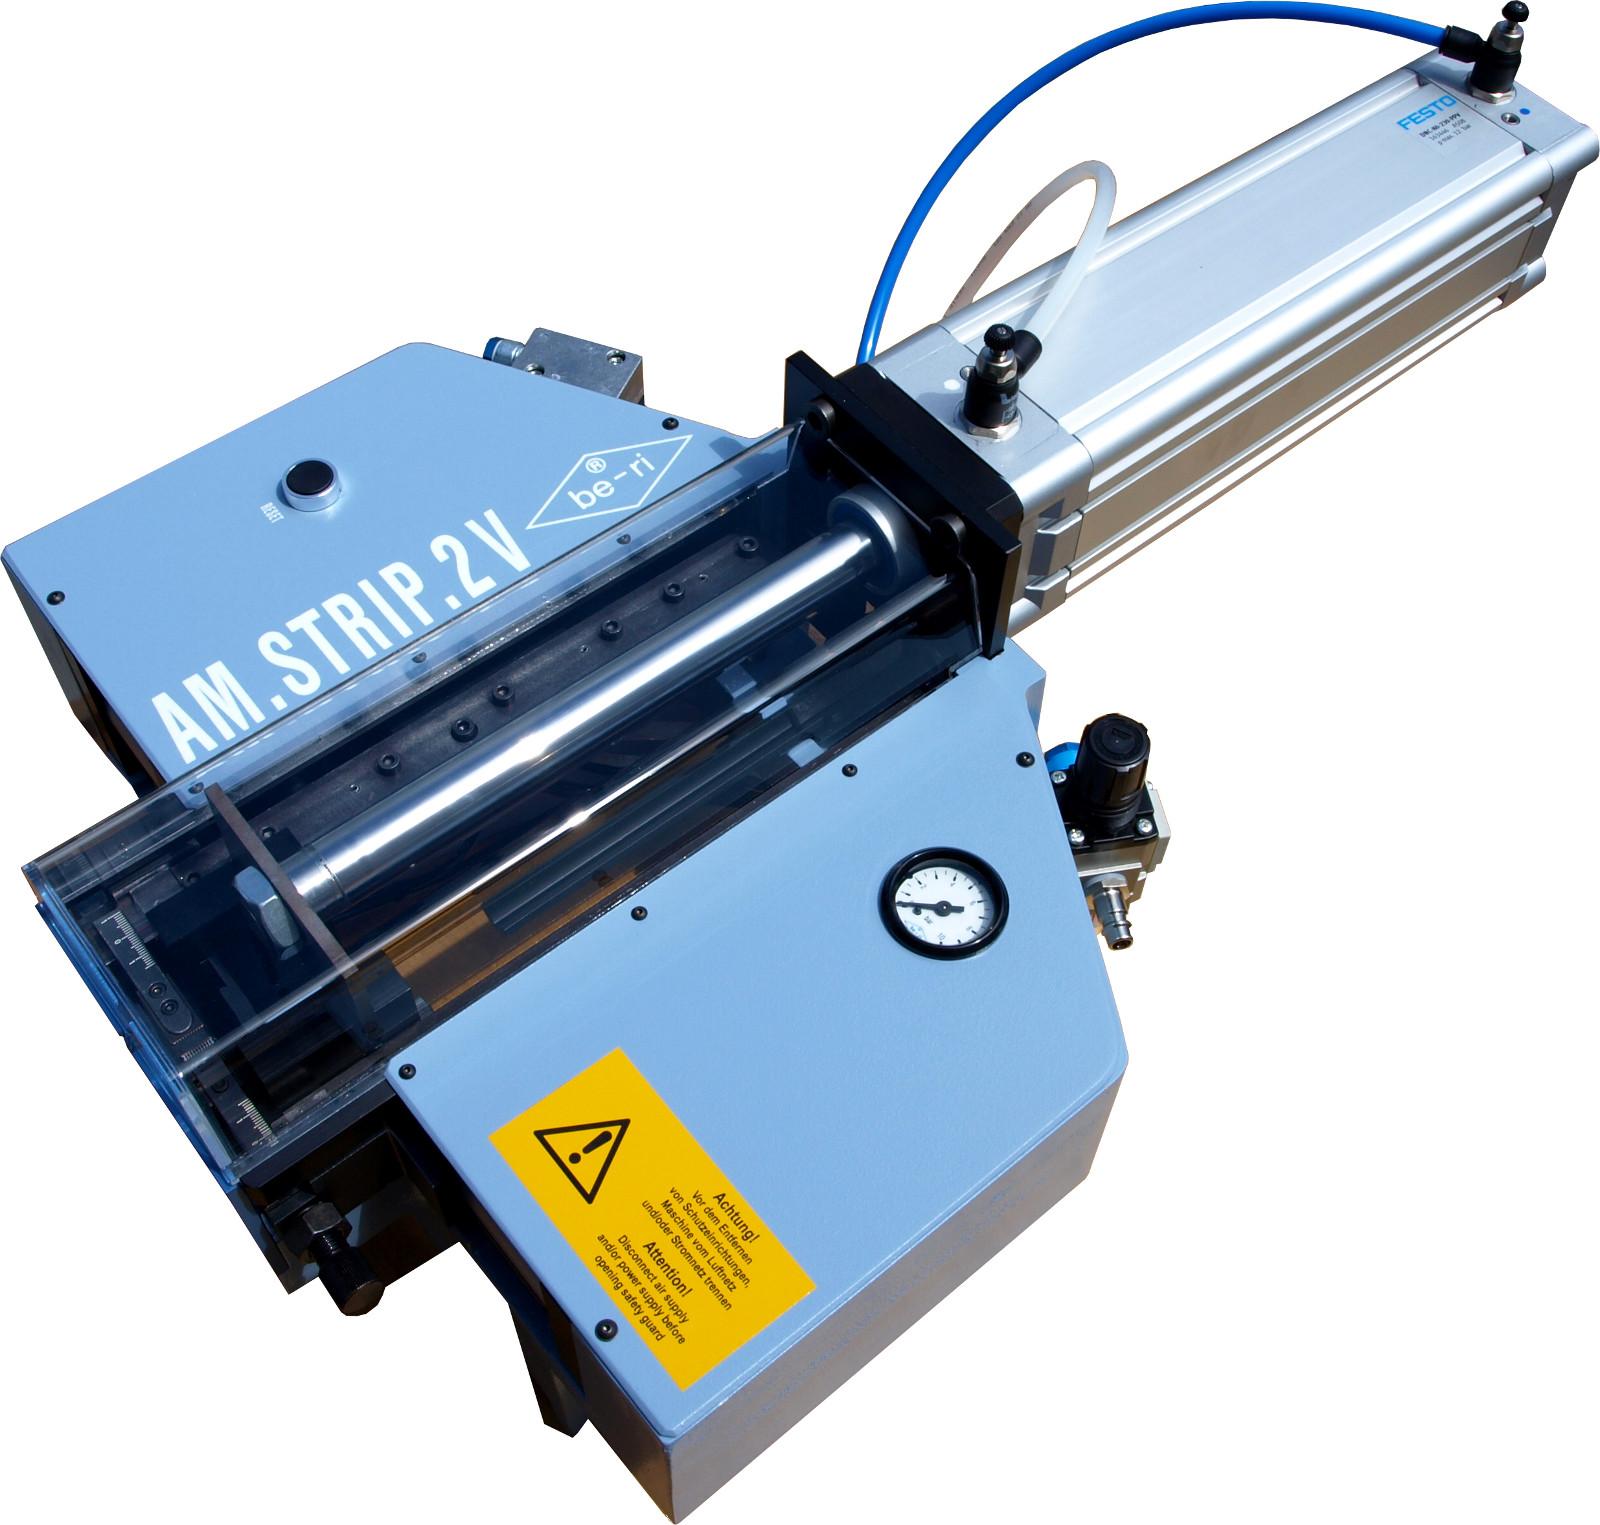 Pneumatic stripping machine AM.STRIP.2V